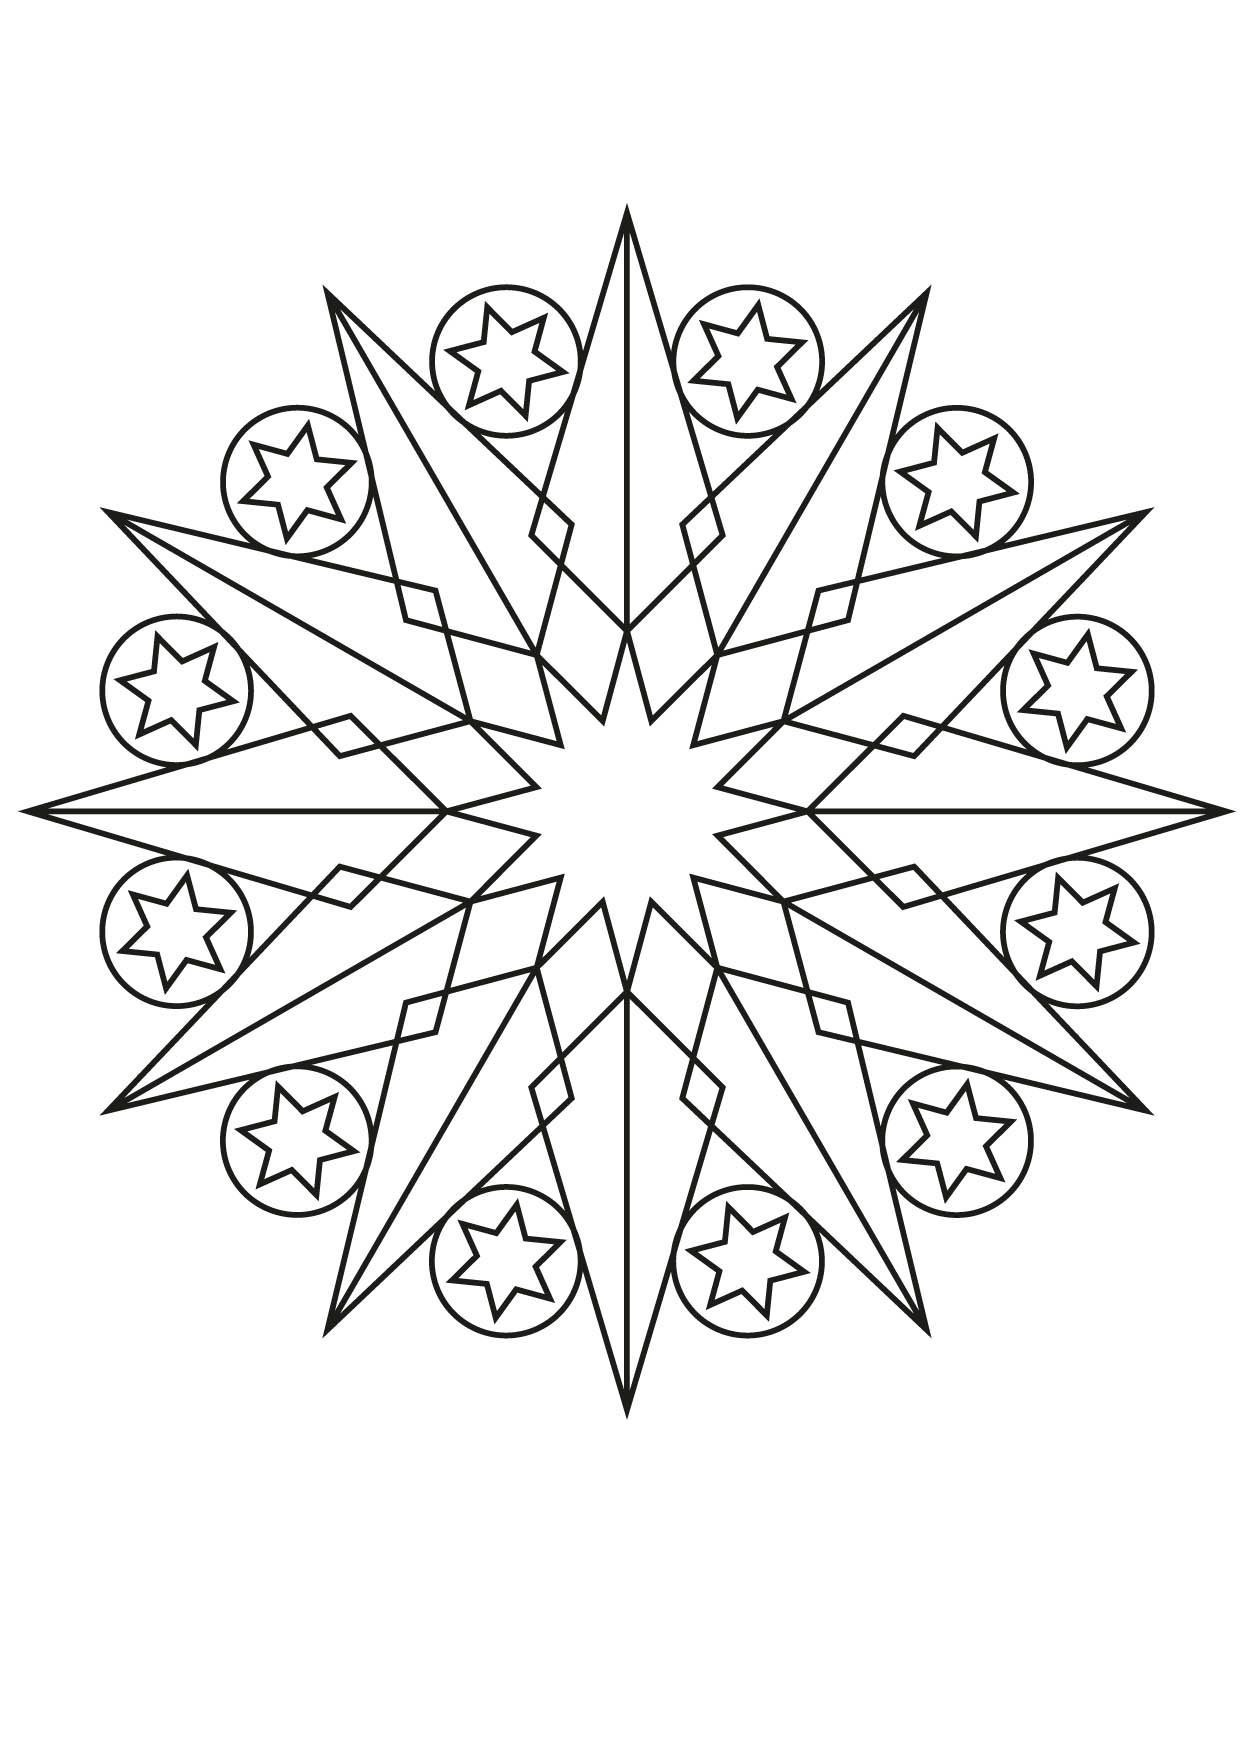 Coloriage Mandala Etoile 2 Coloriage Mandalas Coloriages